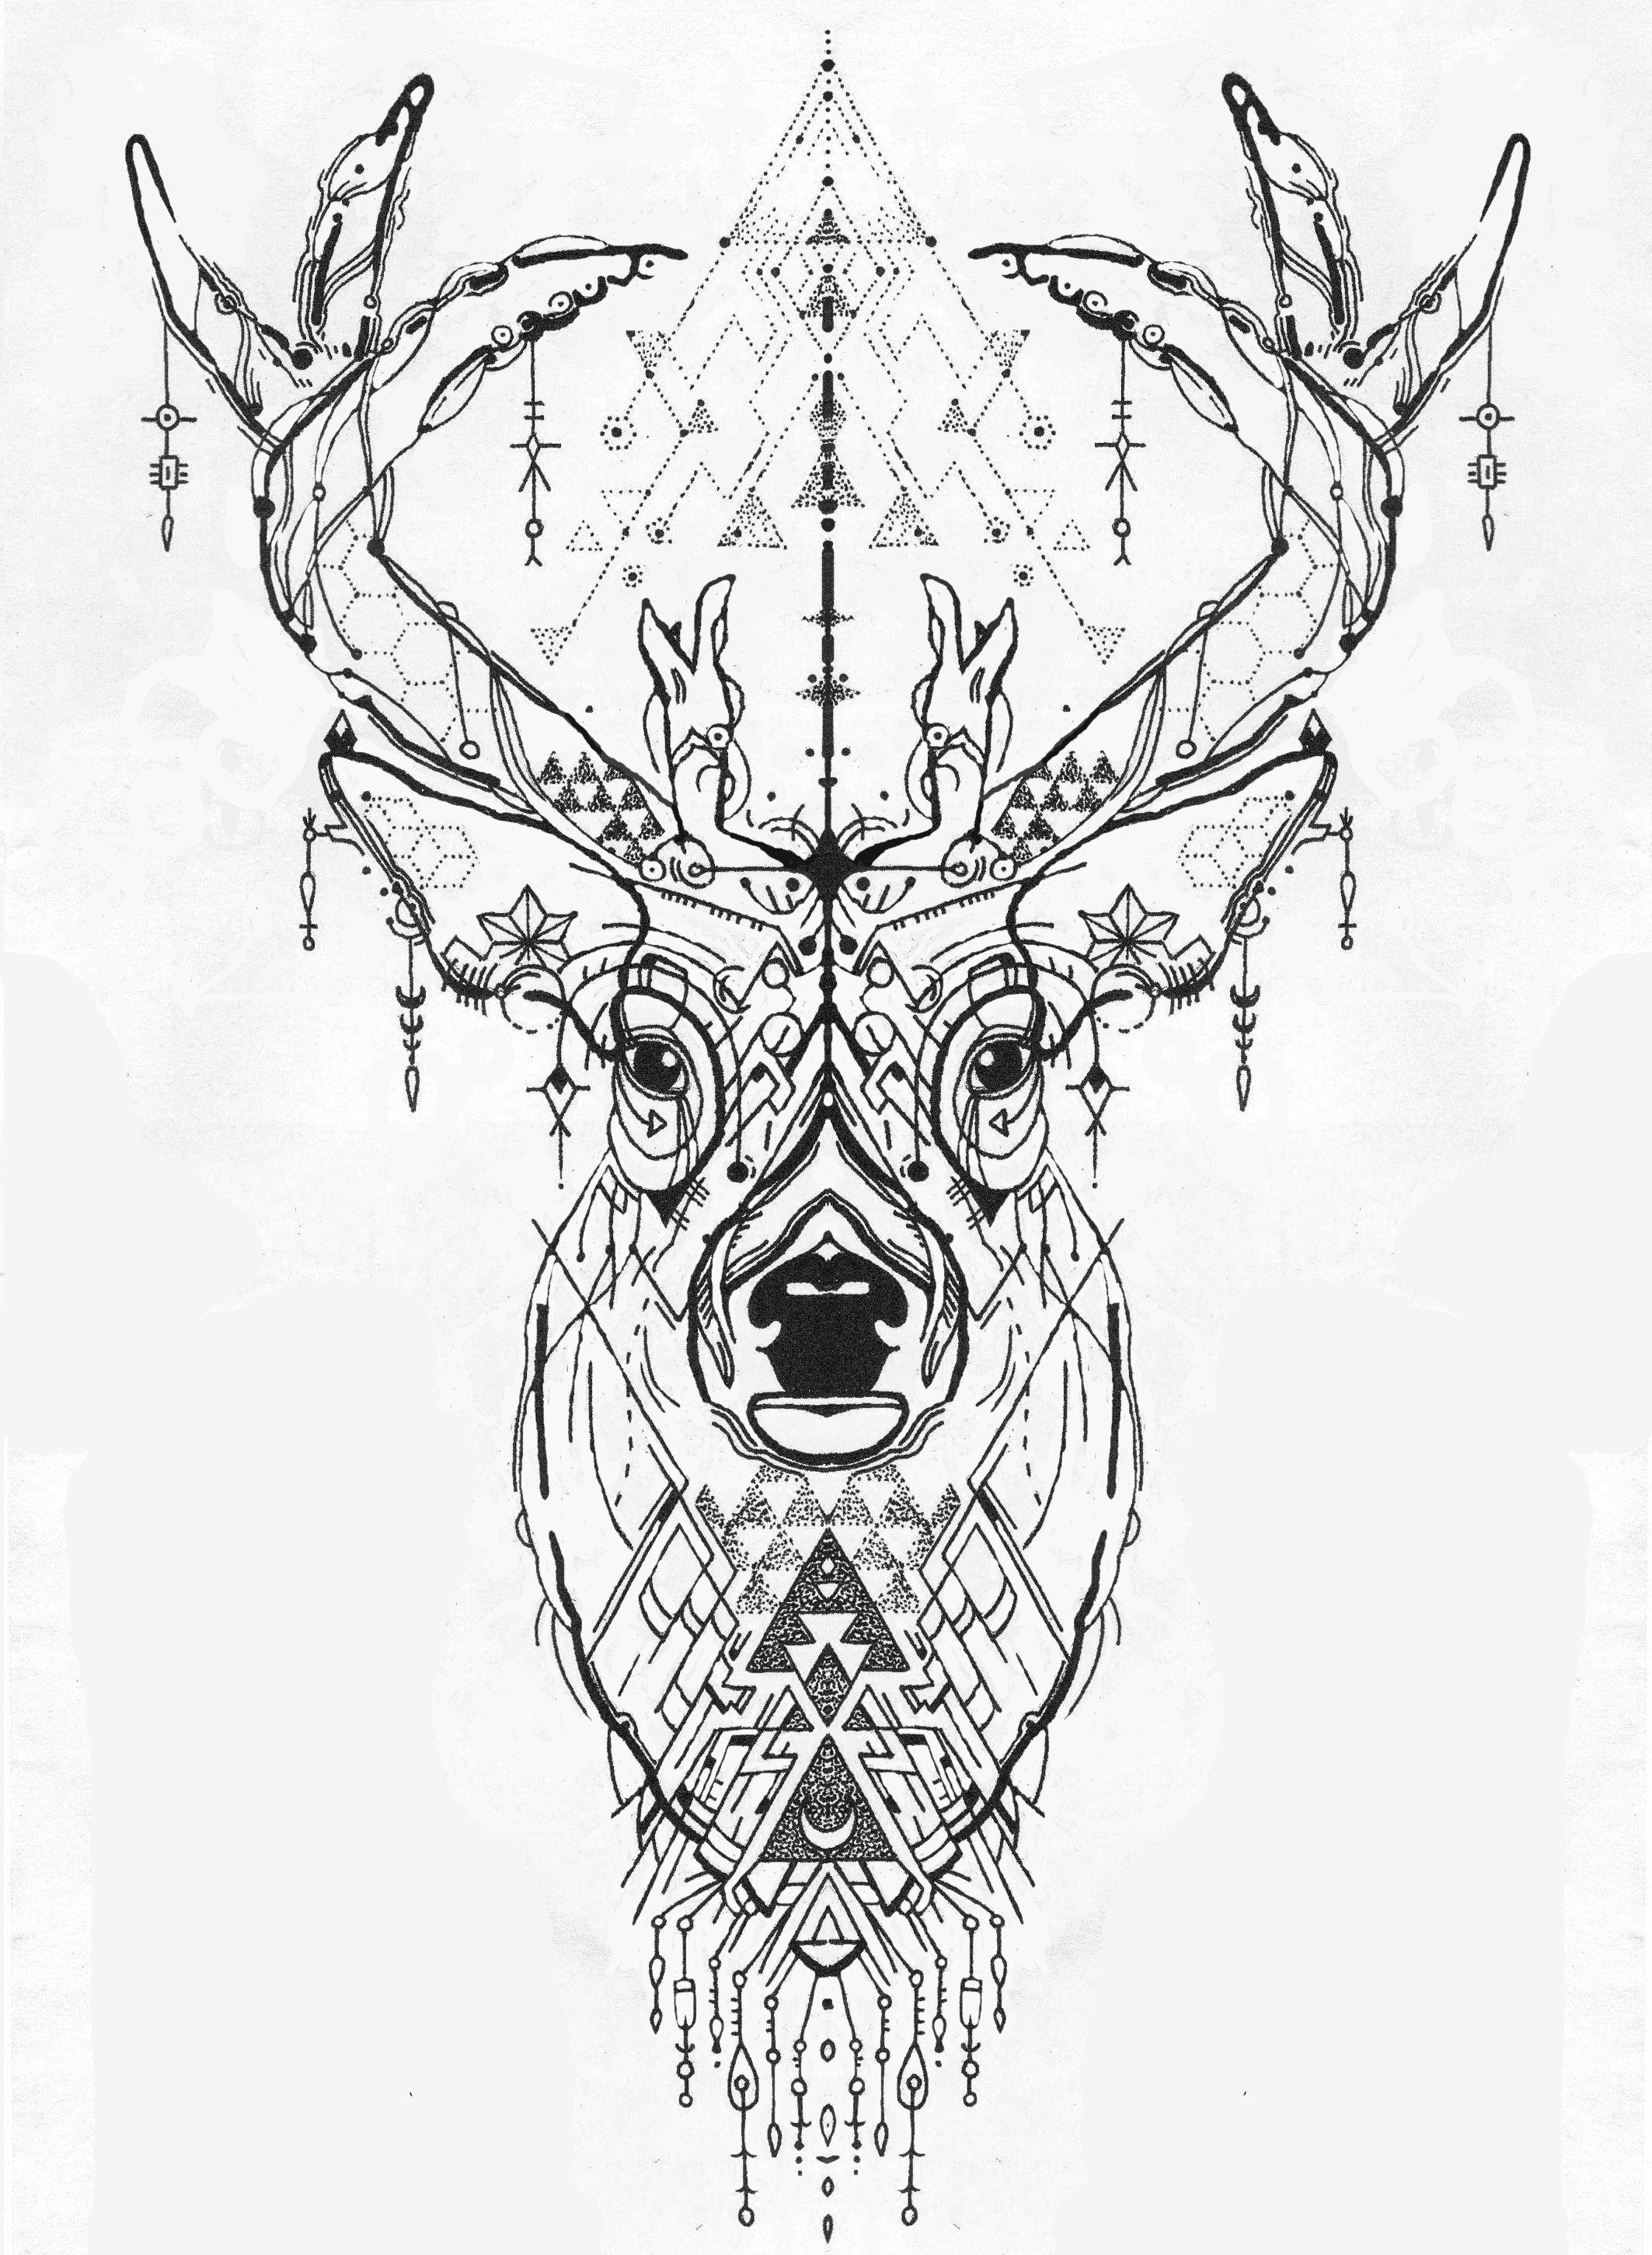 pingl par saya elis sur art inspiration tattoos deer tattoo et tattoo designs. Black Bedroom Furniture Sets. Home Design Ideas